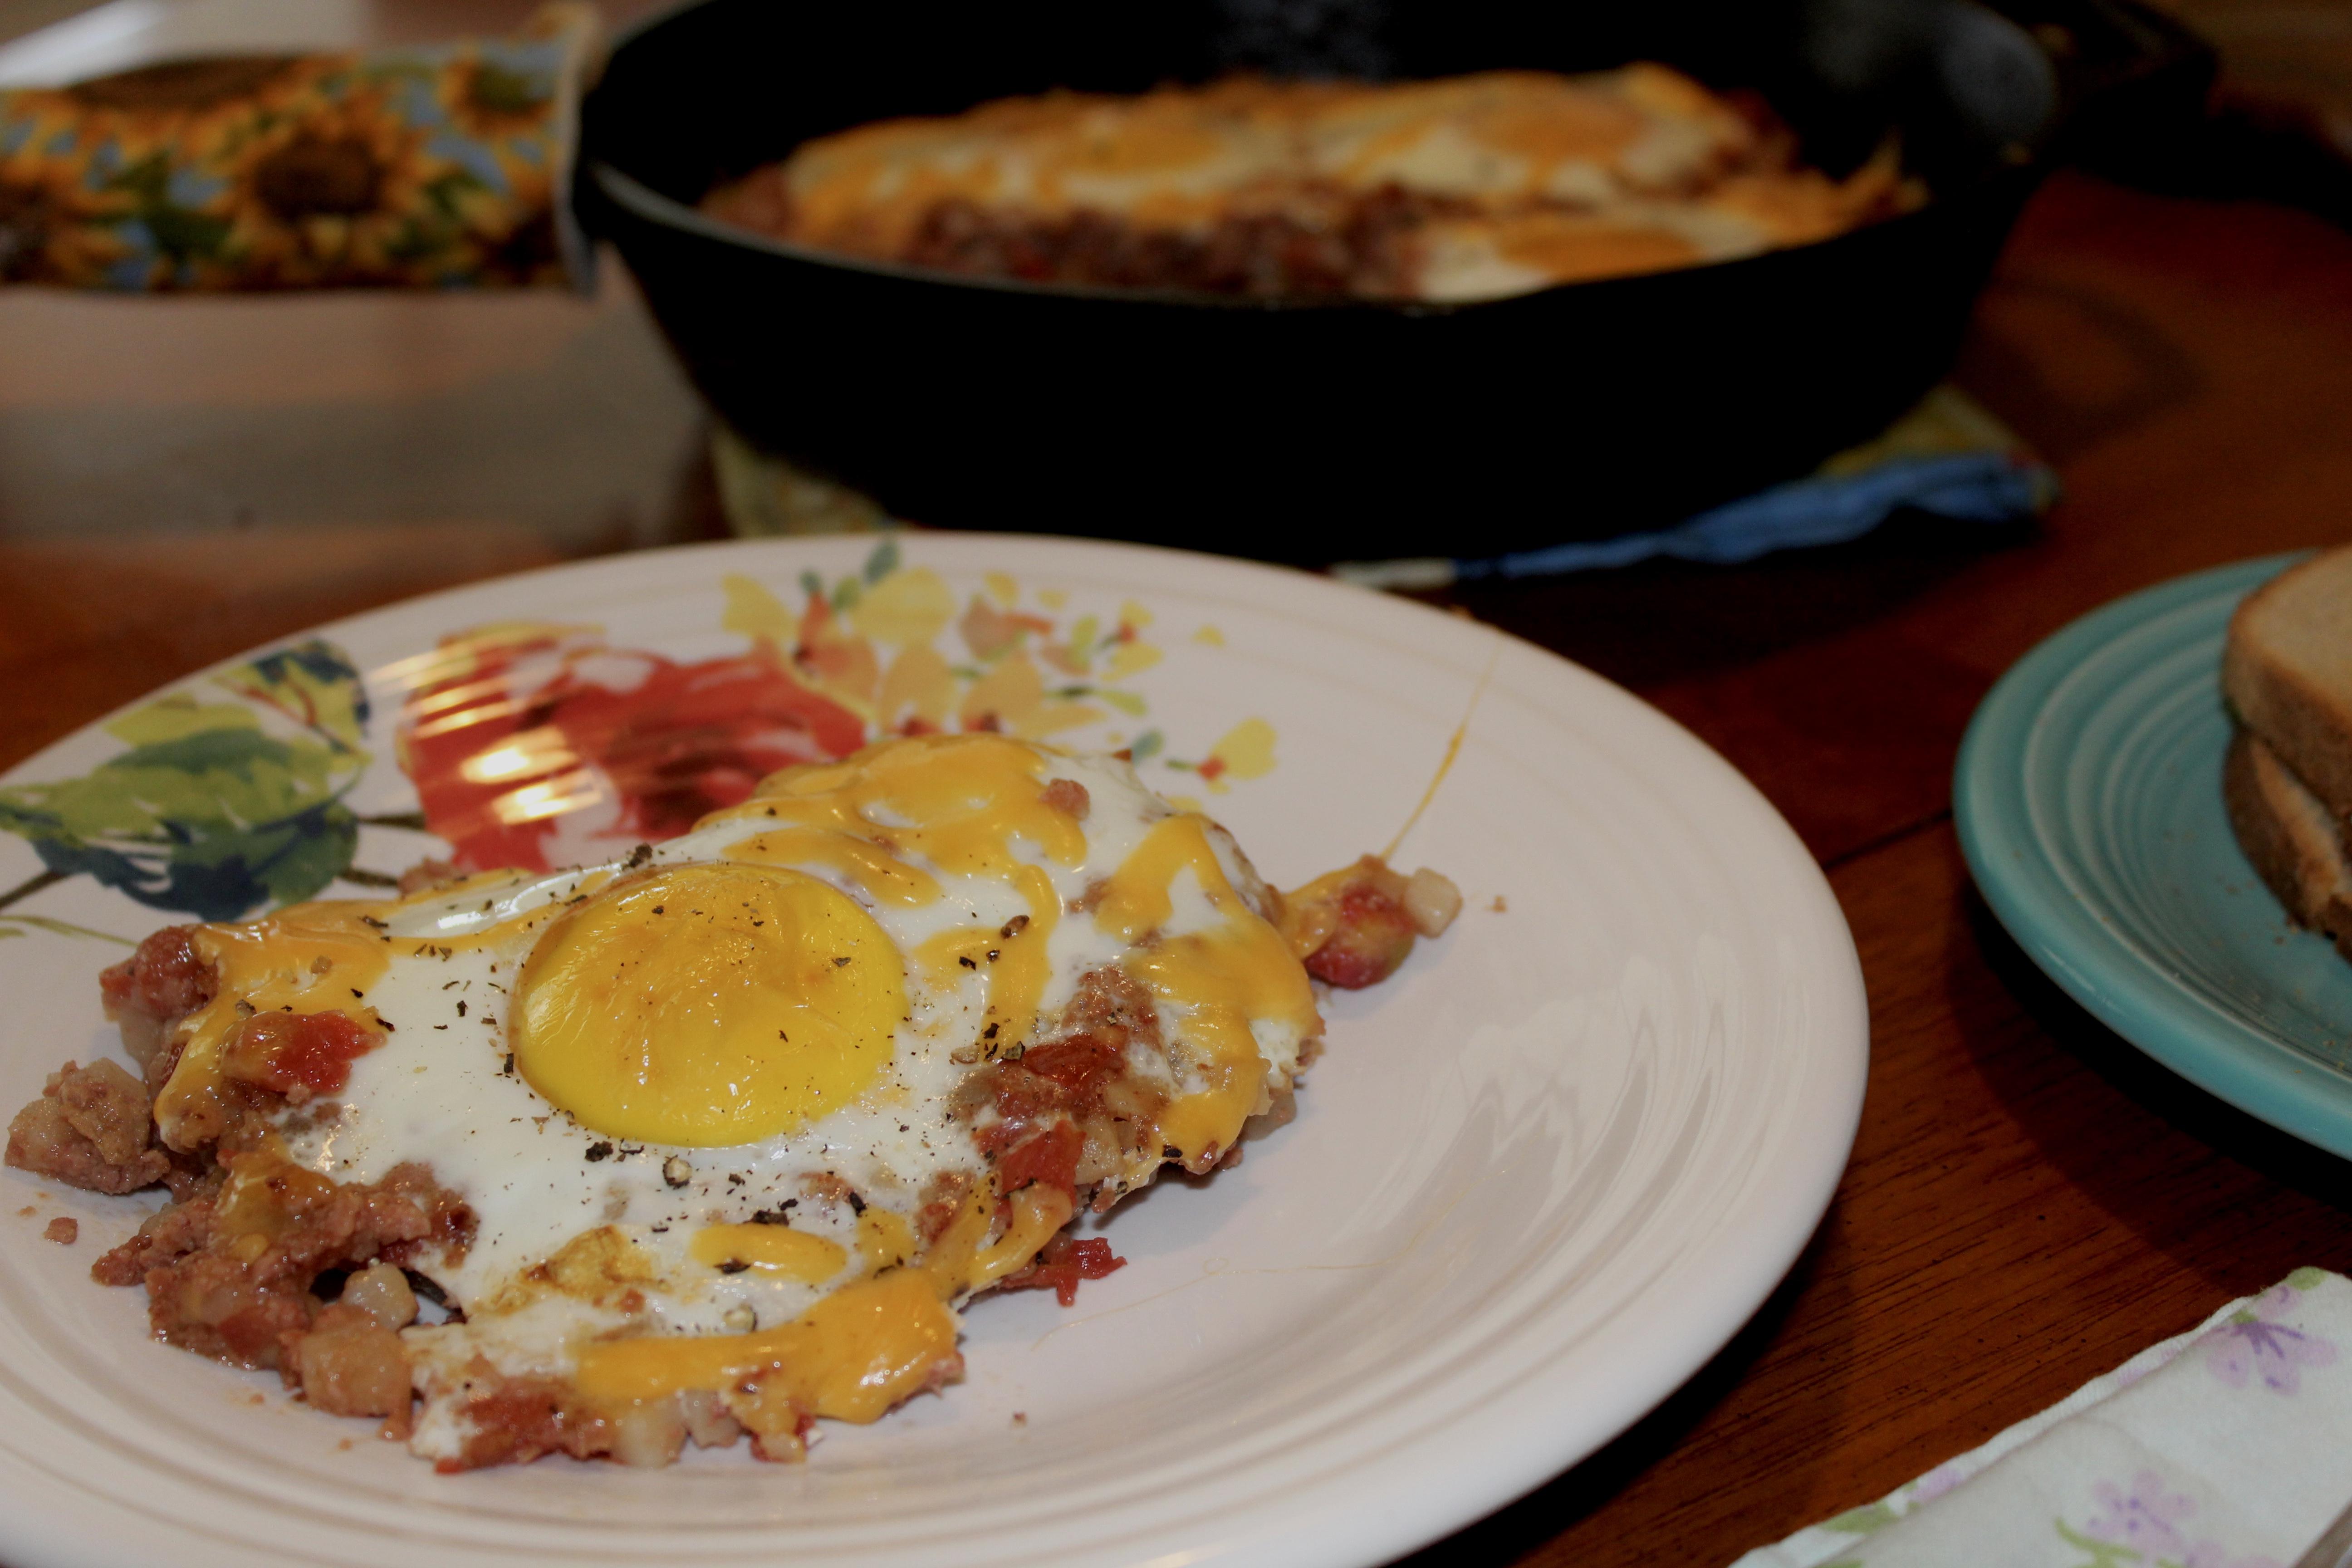 One Skillet Corned Beef Hash Breakfast